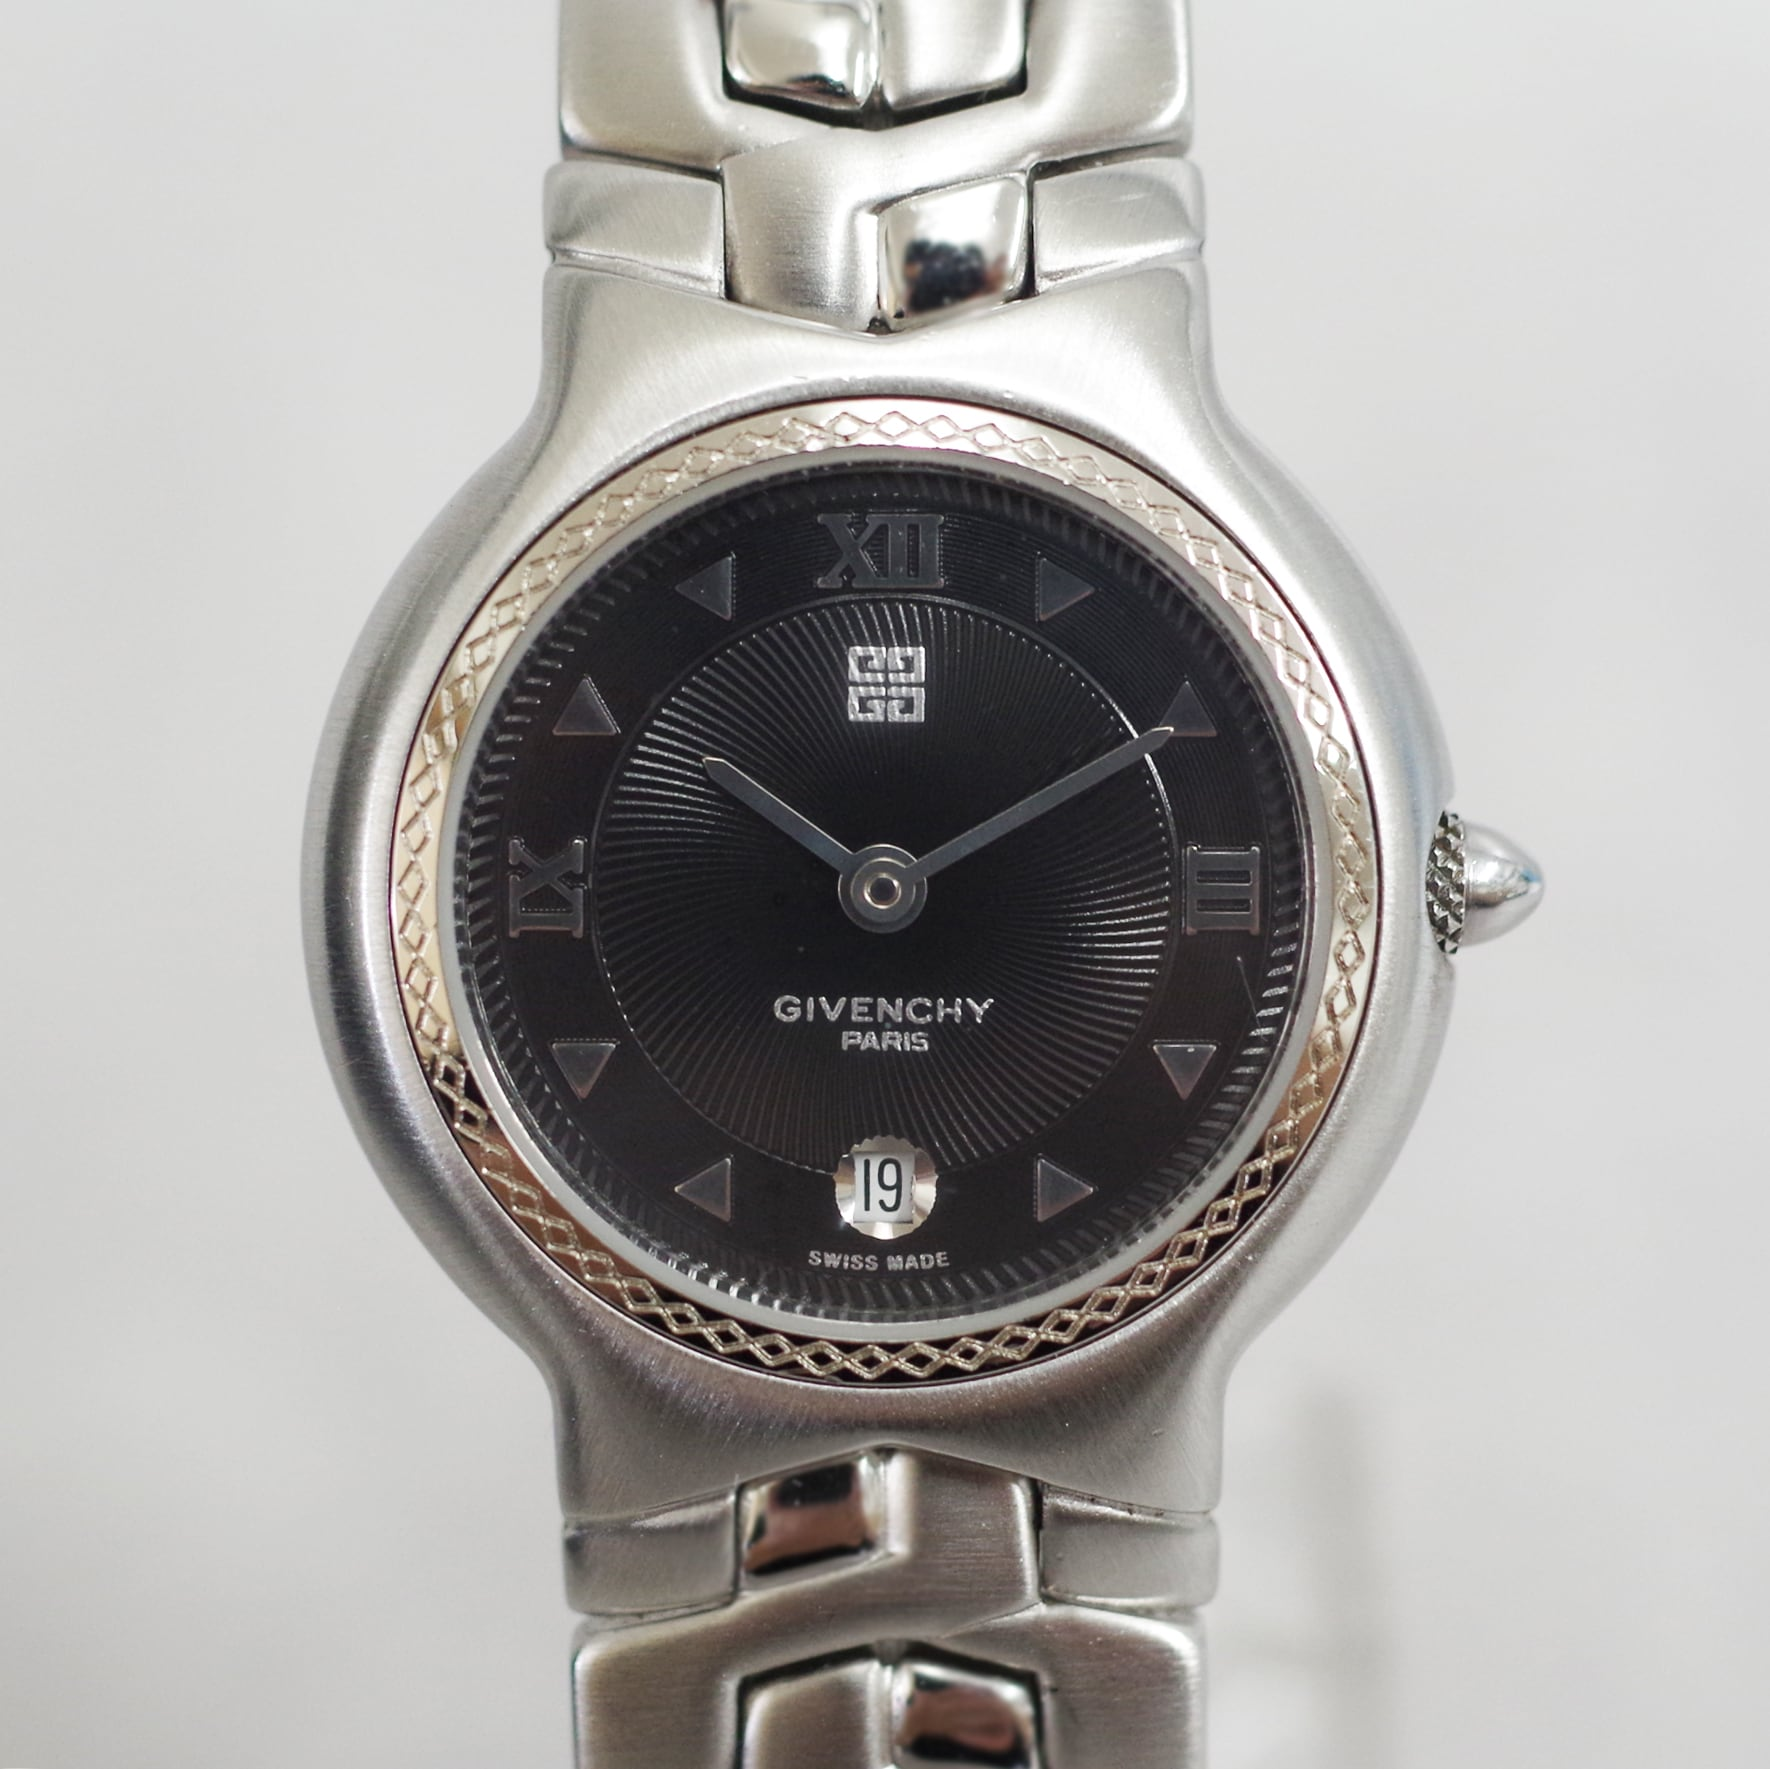 GIVENCHY ジバンシィ VERRAZANO REG.MODEL クォーツ SS ブラック文字盤 腕時計 レディース